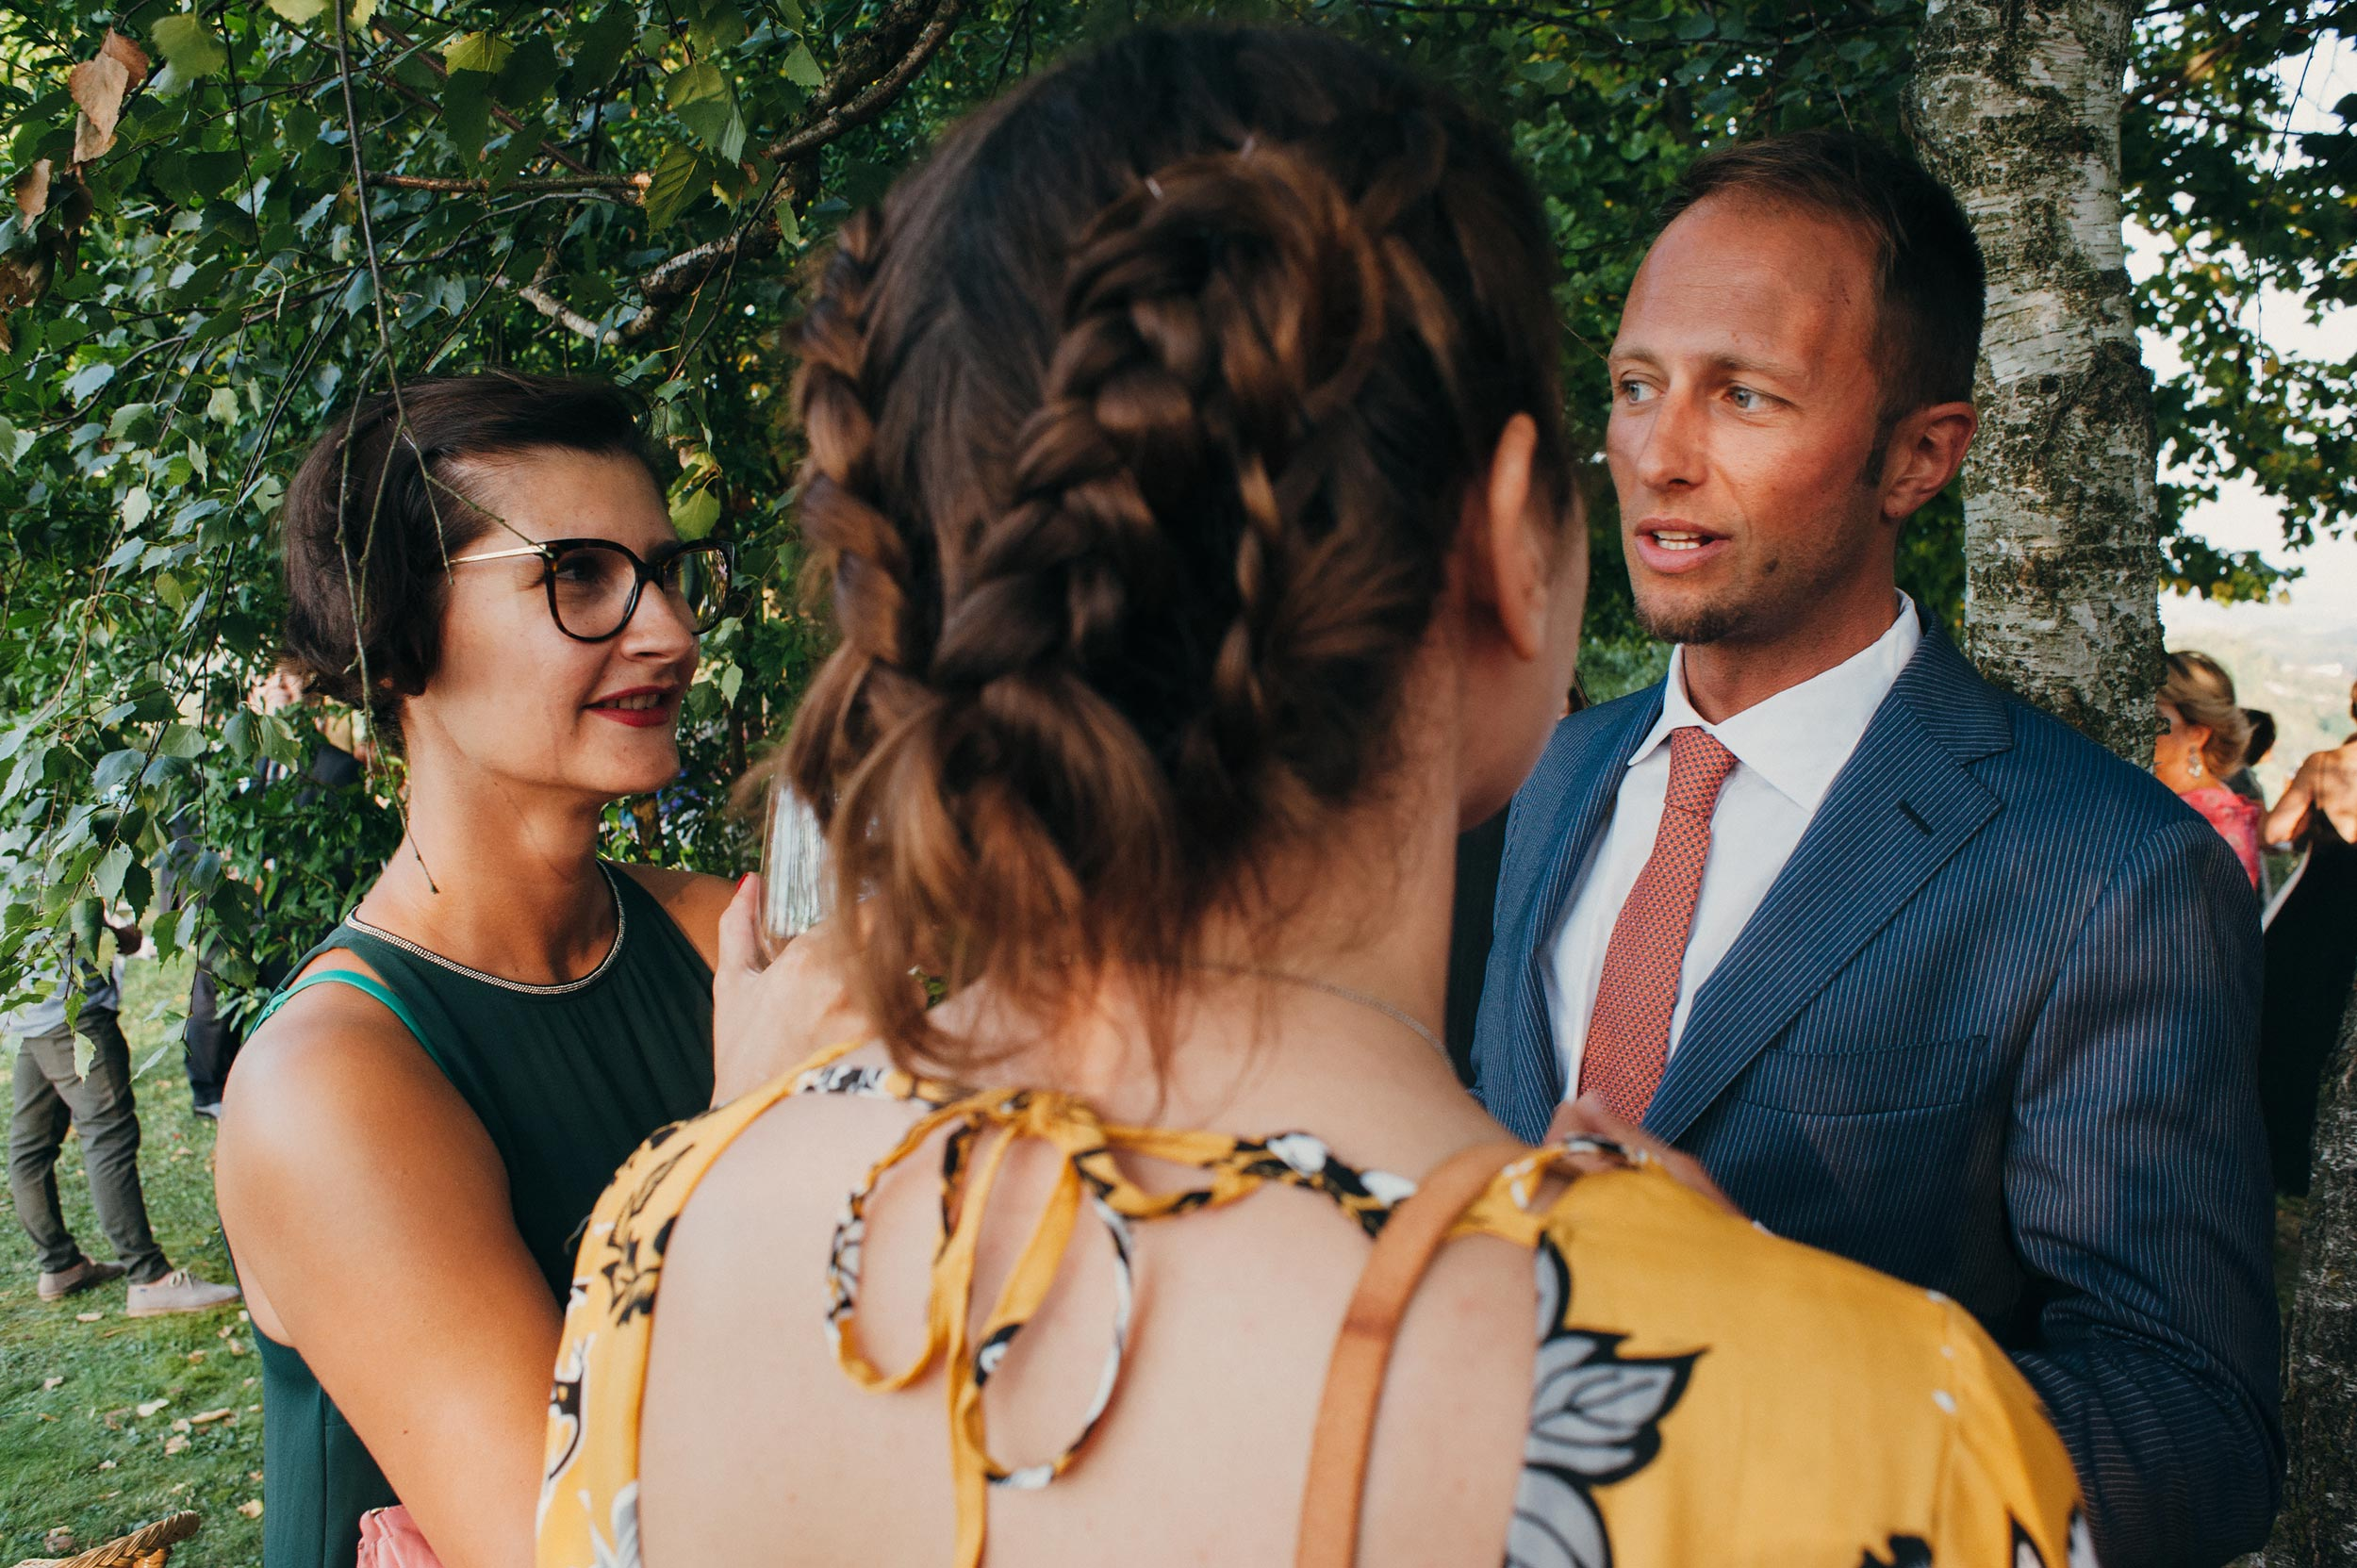 2016-Davor-Chiara-Monferrato-Asti-Vercelli-Wedding-Photographer-Italy-Alessandro-Avenali-52.jpg